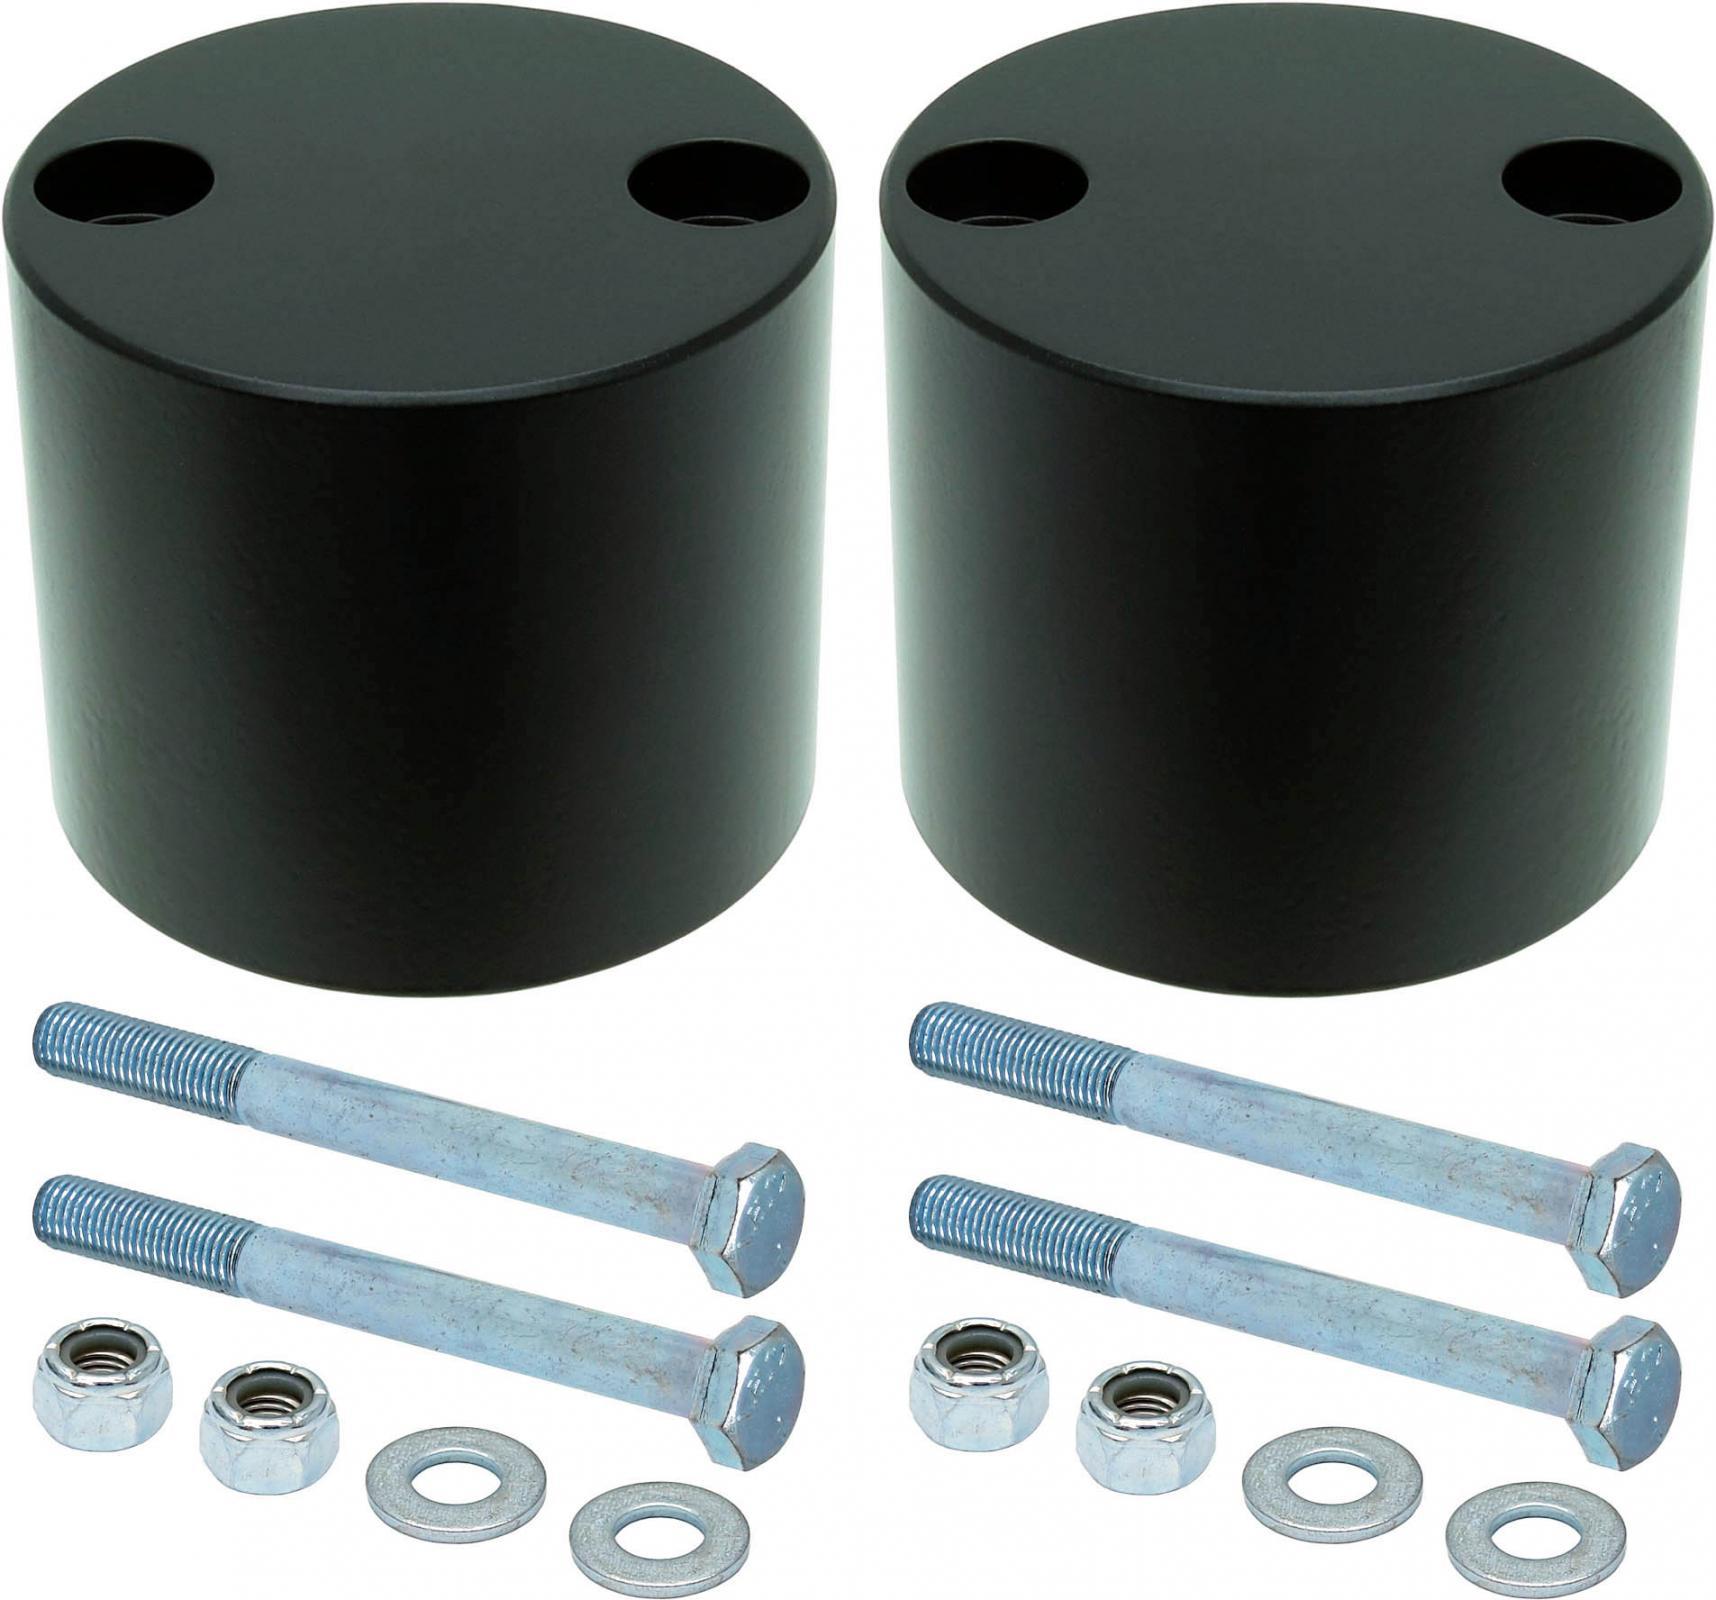 RockJock Rear Bump Stop Extension Kit - JK